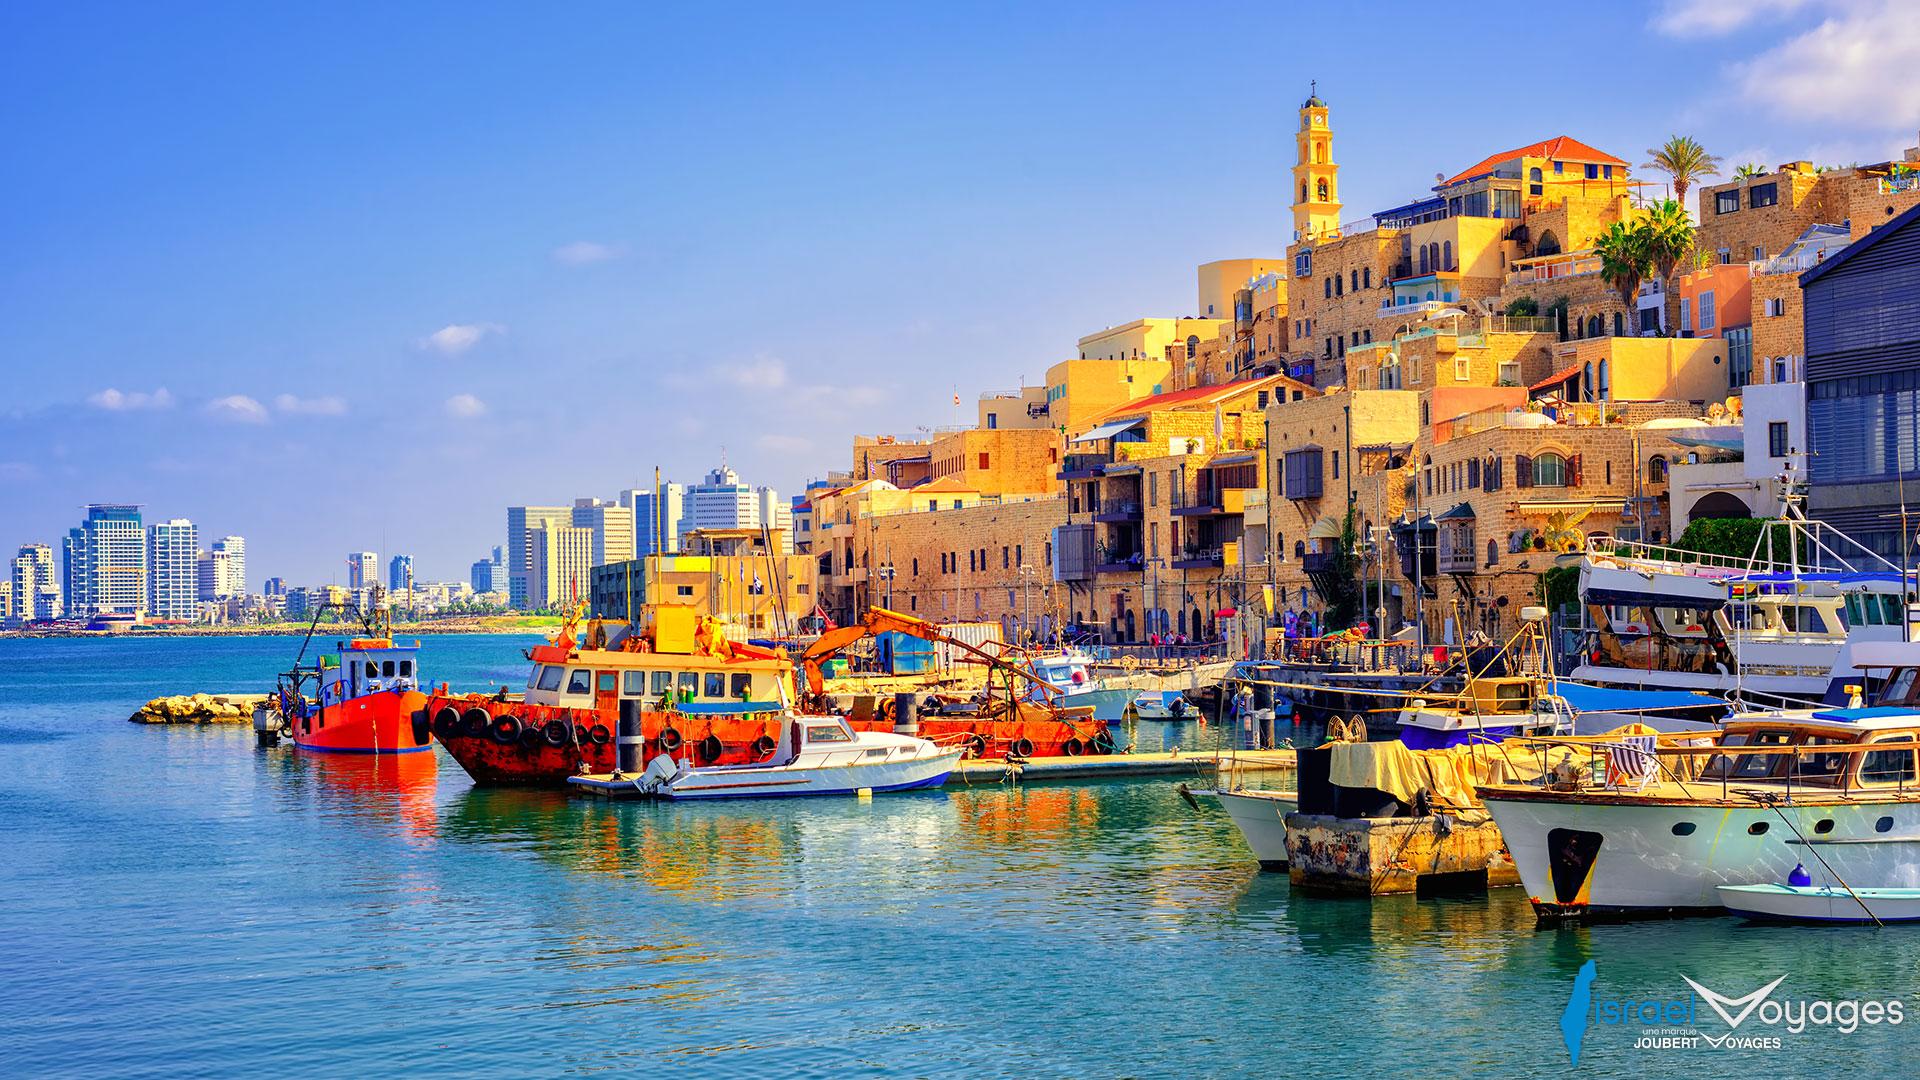 Vieux port de Jaffa